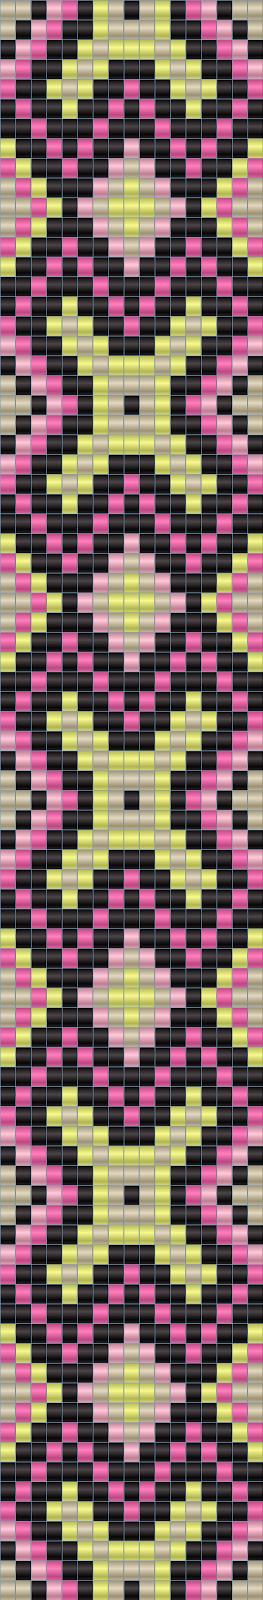 Схема браслета - ткачество